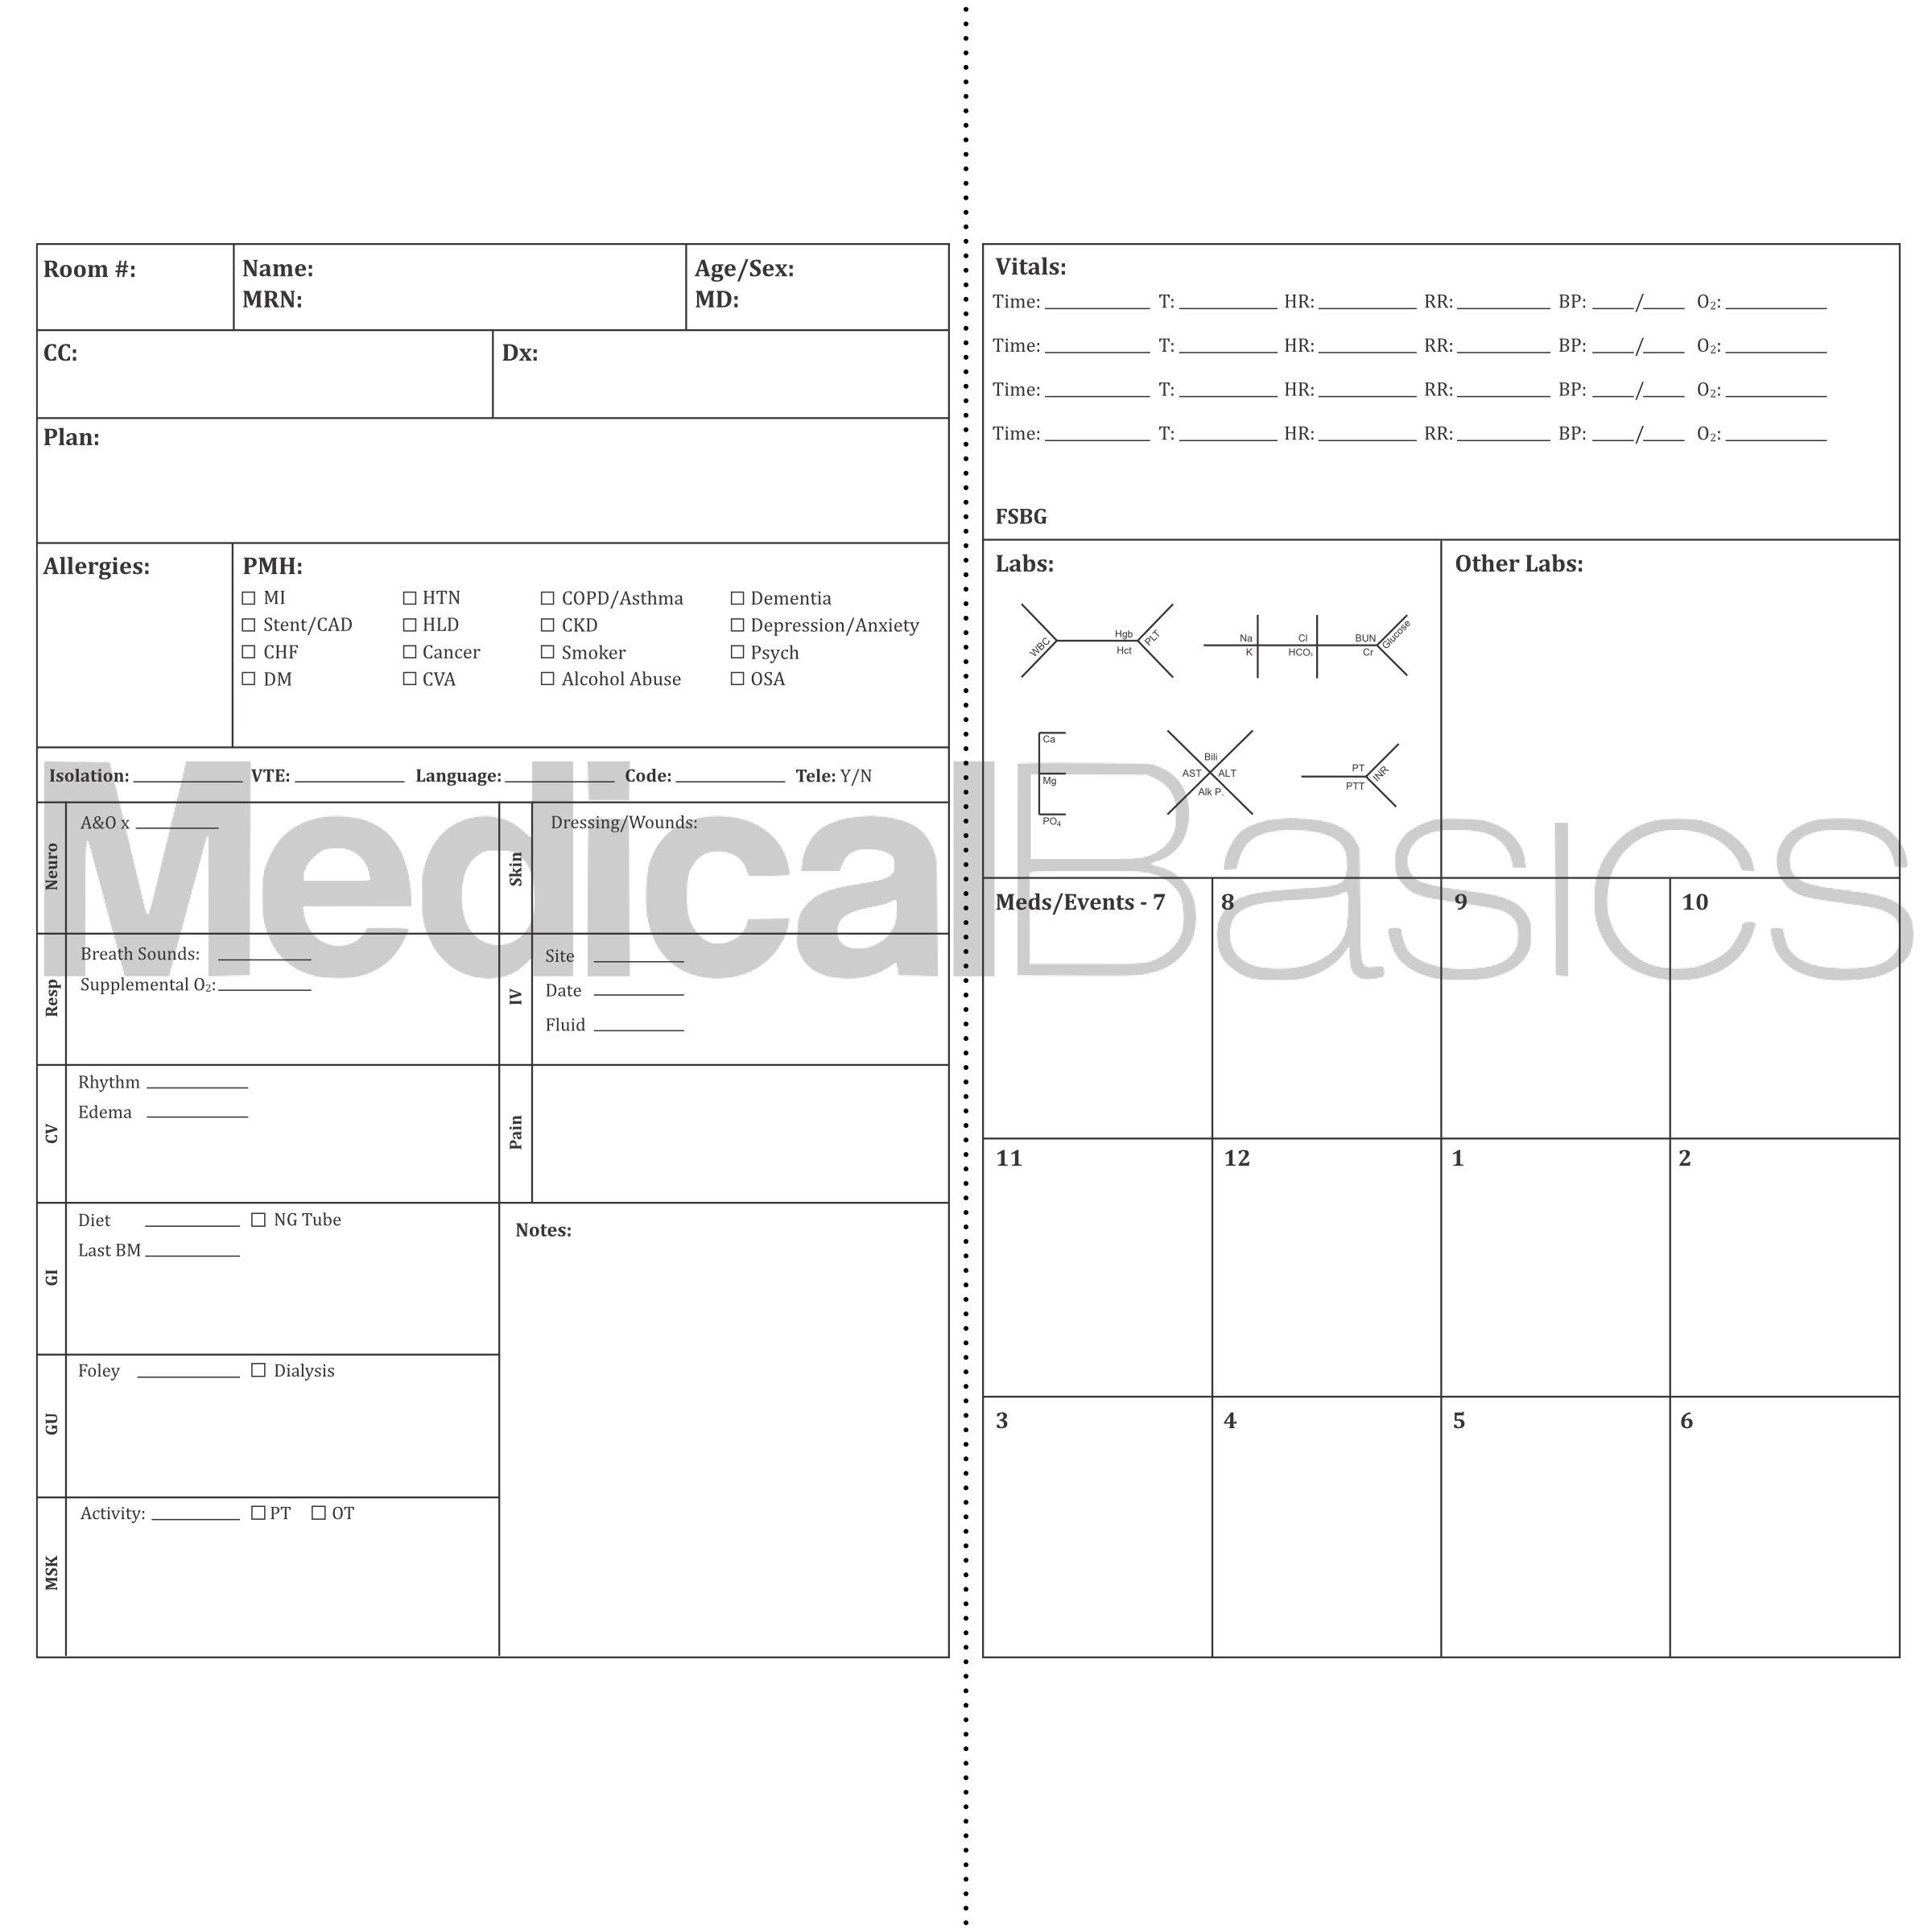 Pocket Nurse Report Sheet Notebook - Brain Sheet Template for MedSurg Nurses and CNA by Medical Basics (Image #2)